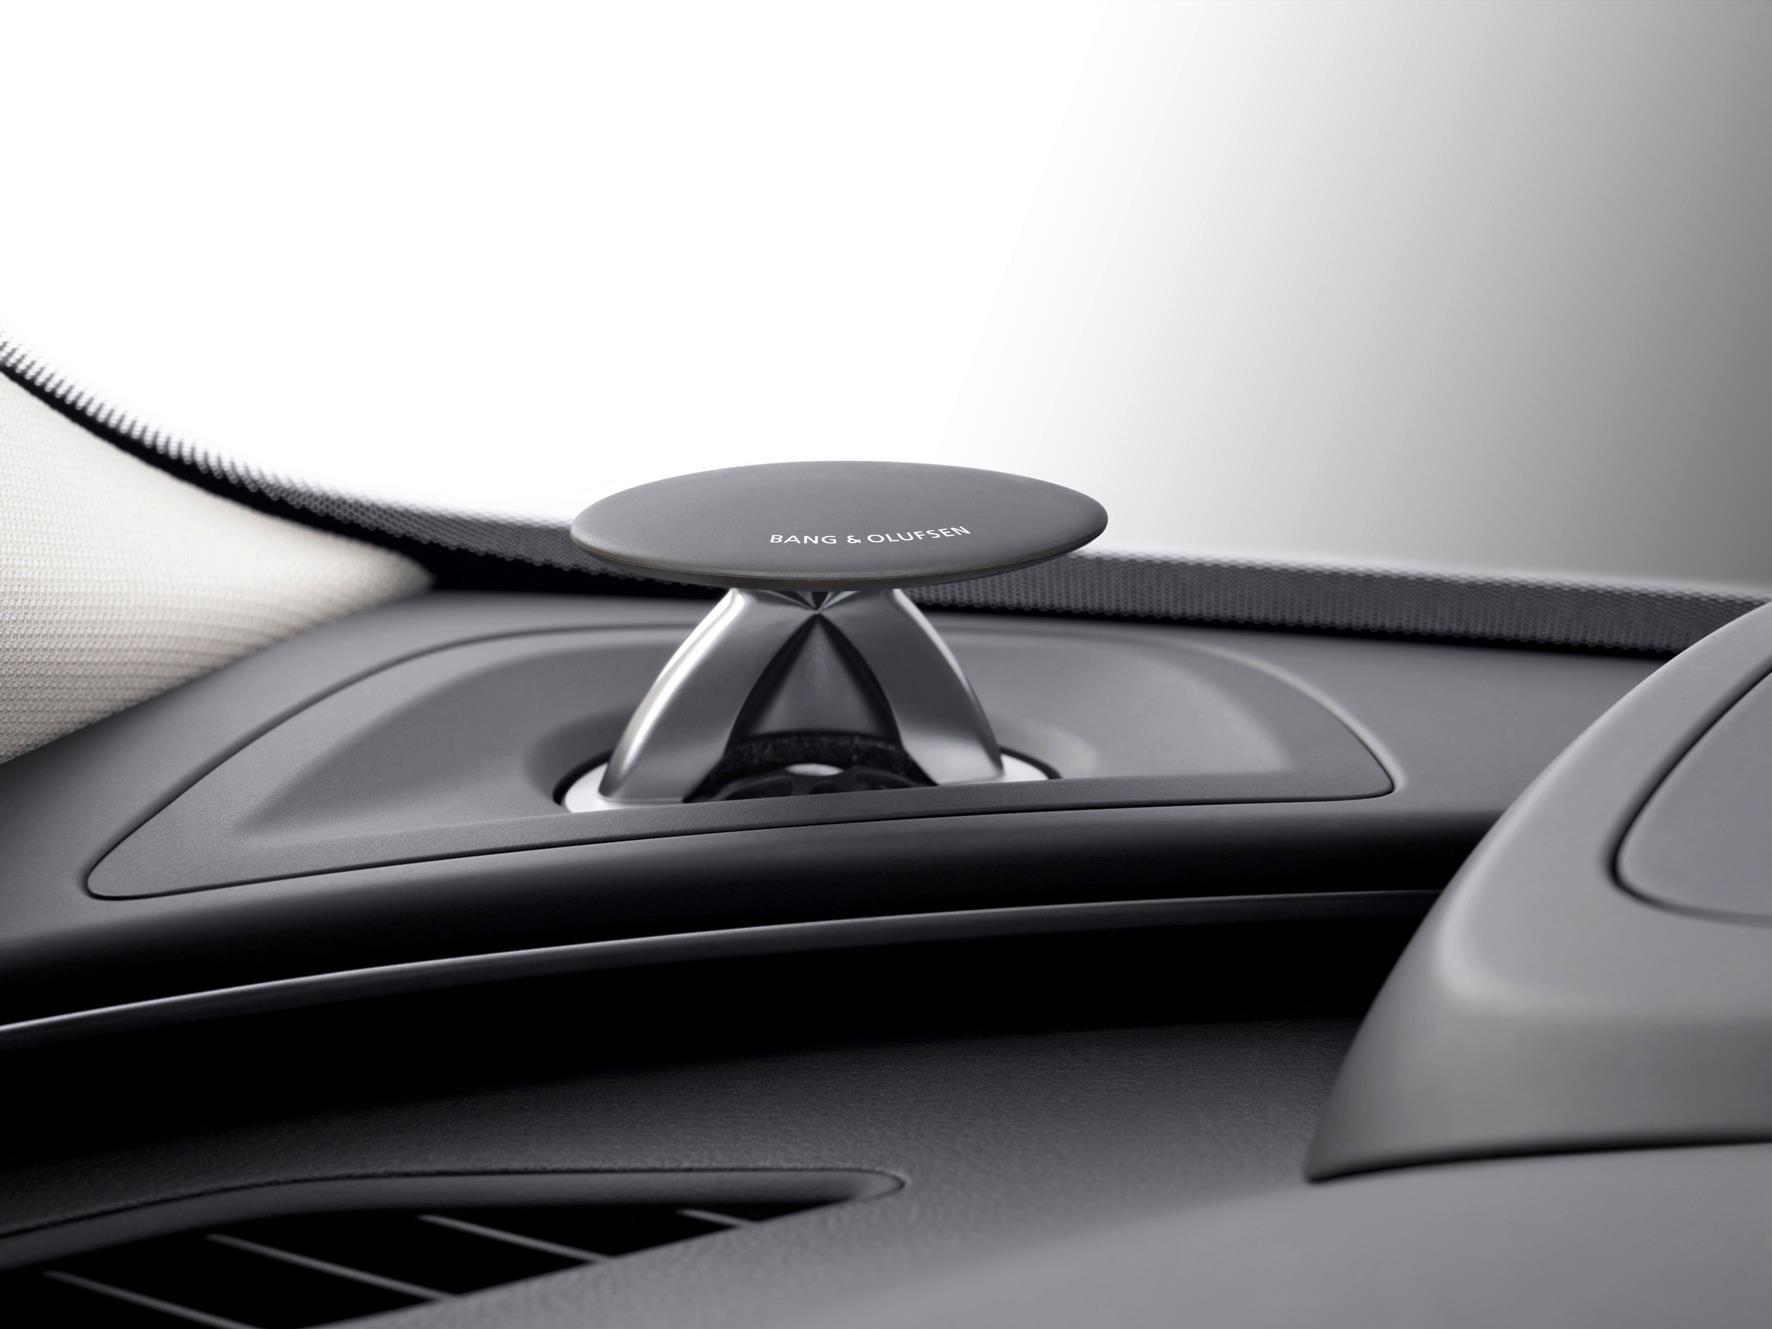 Bang & Olufsen for Audi Car interior design, Audi, Detail